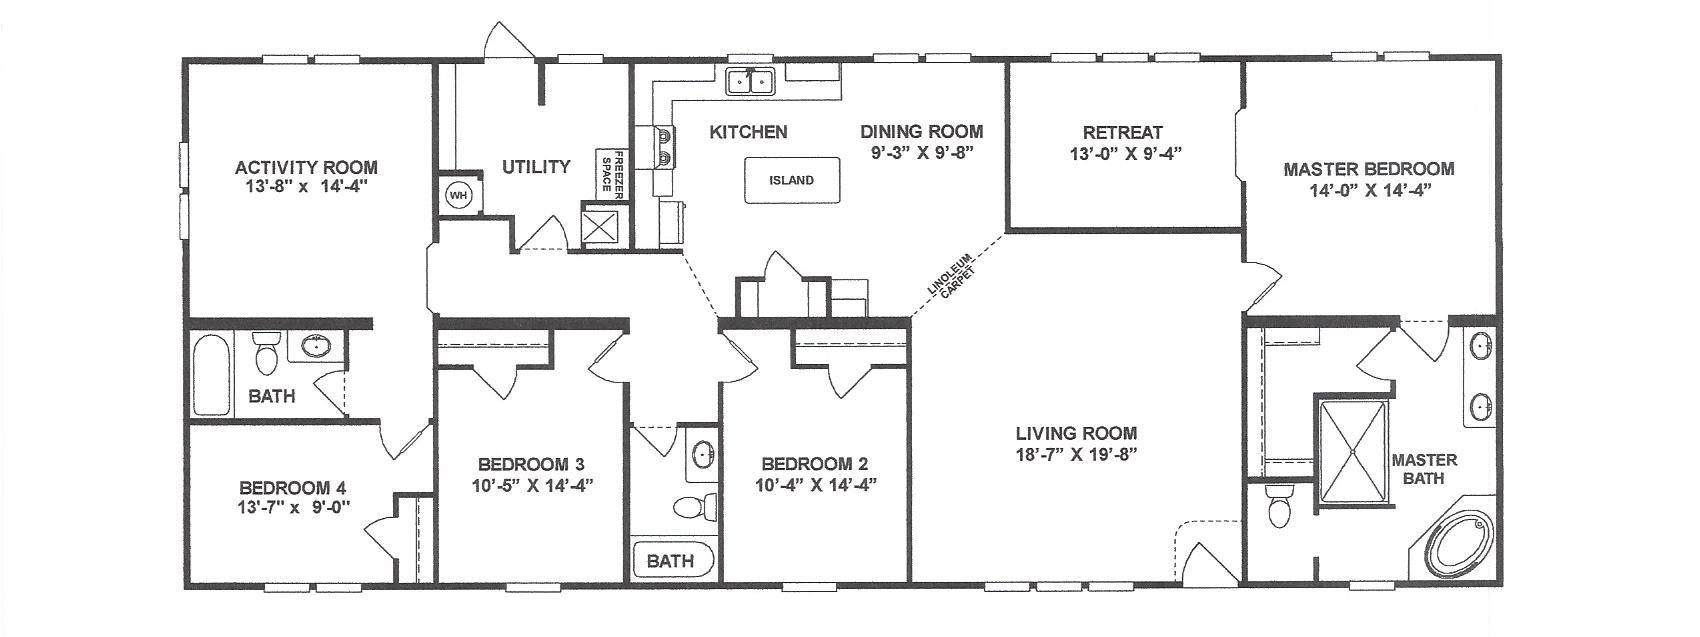 4 bedroom 3 bath 32x78 11 schult homes